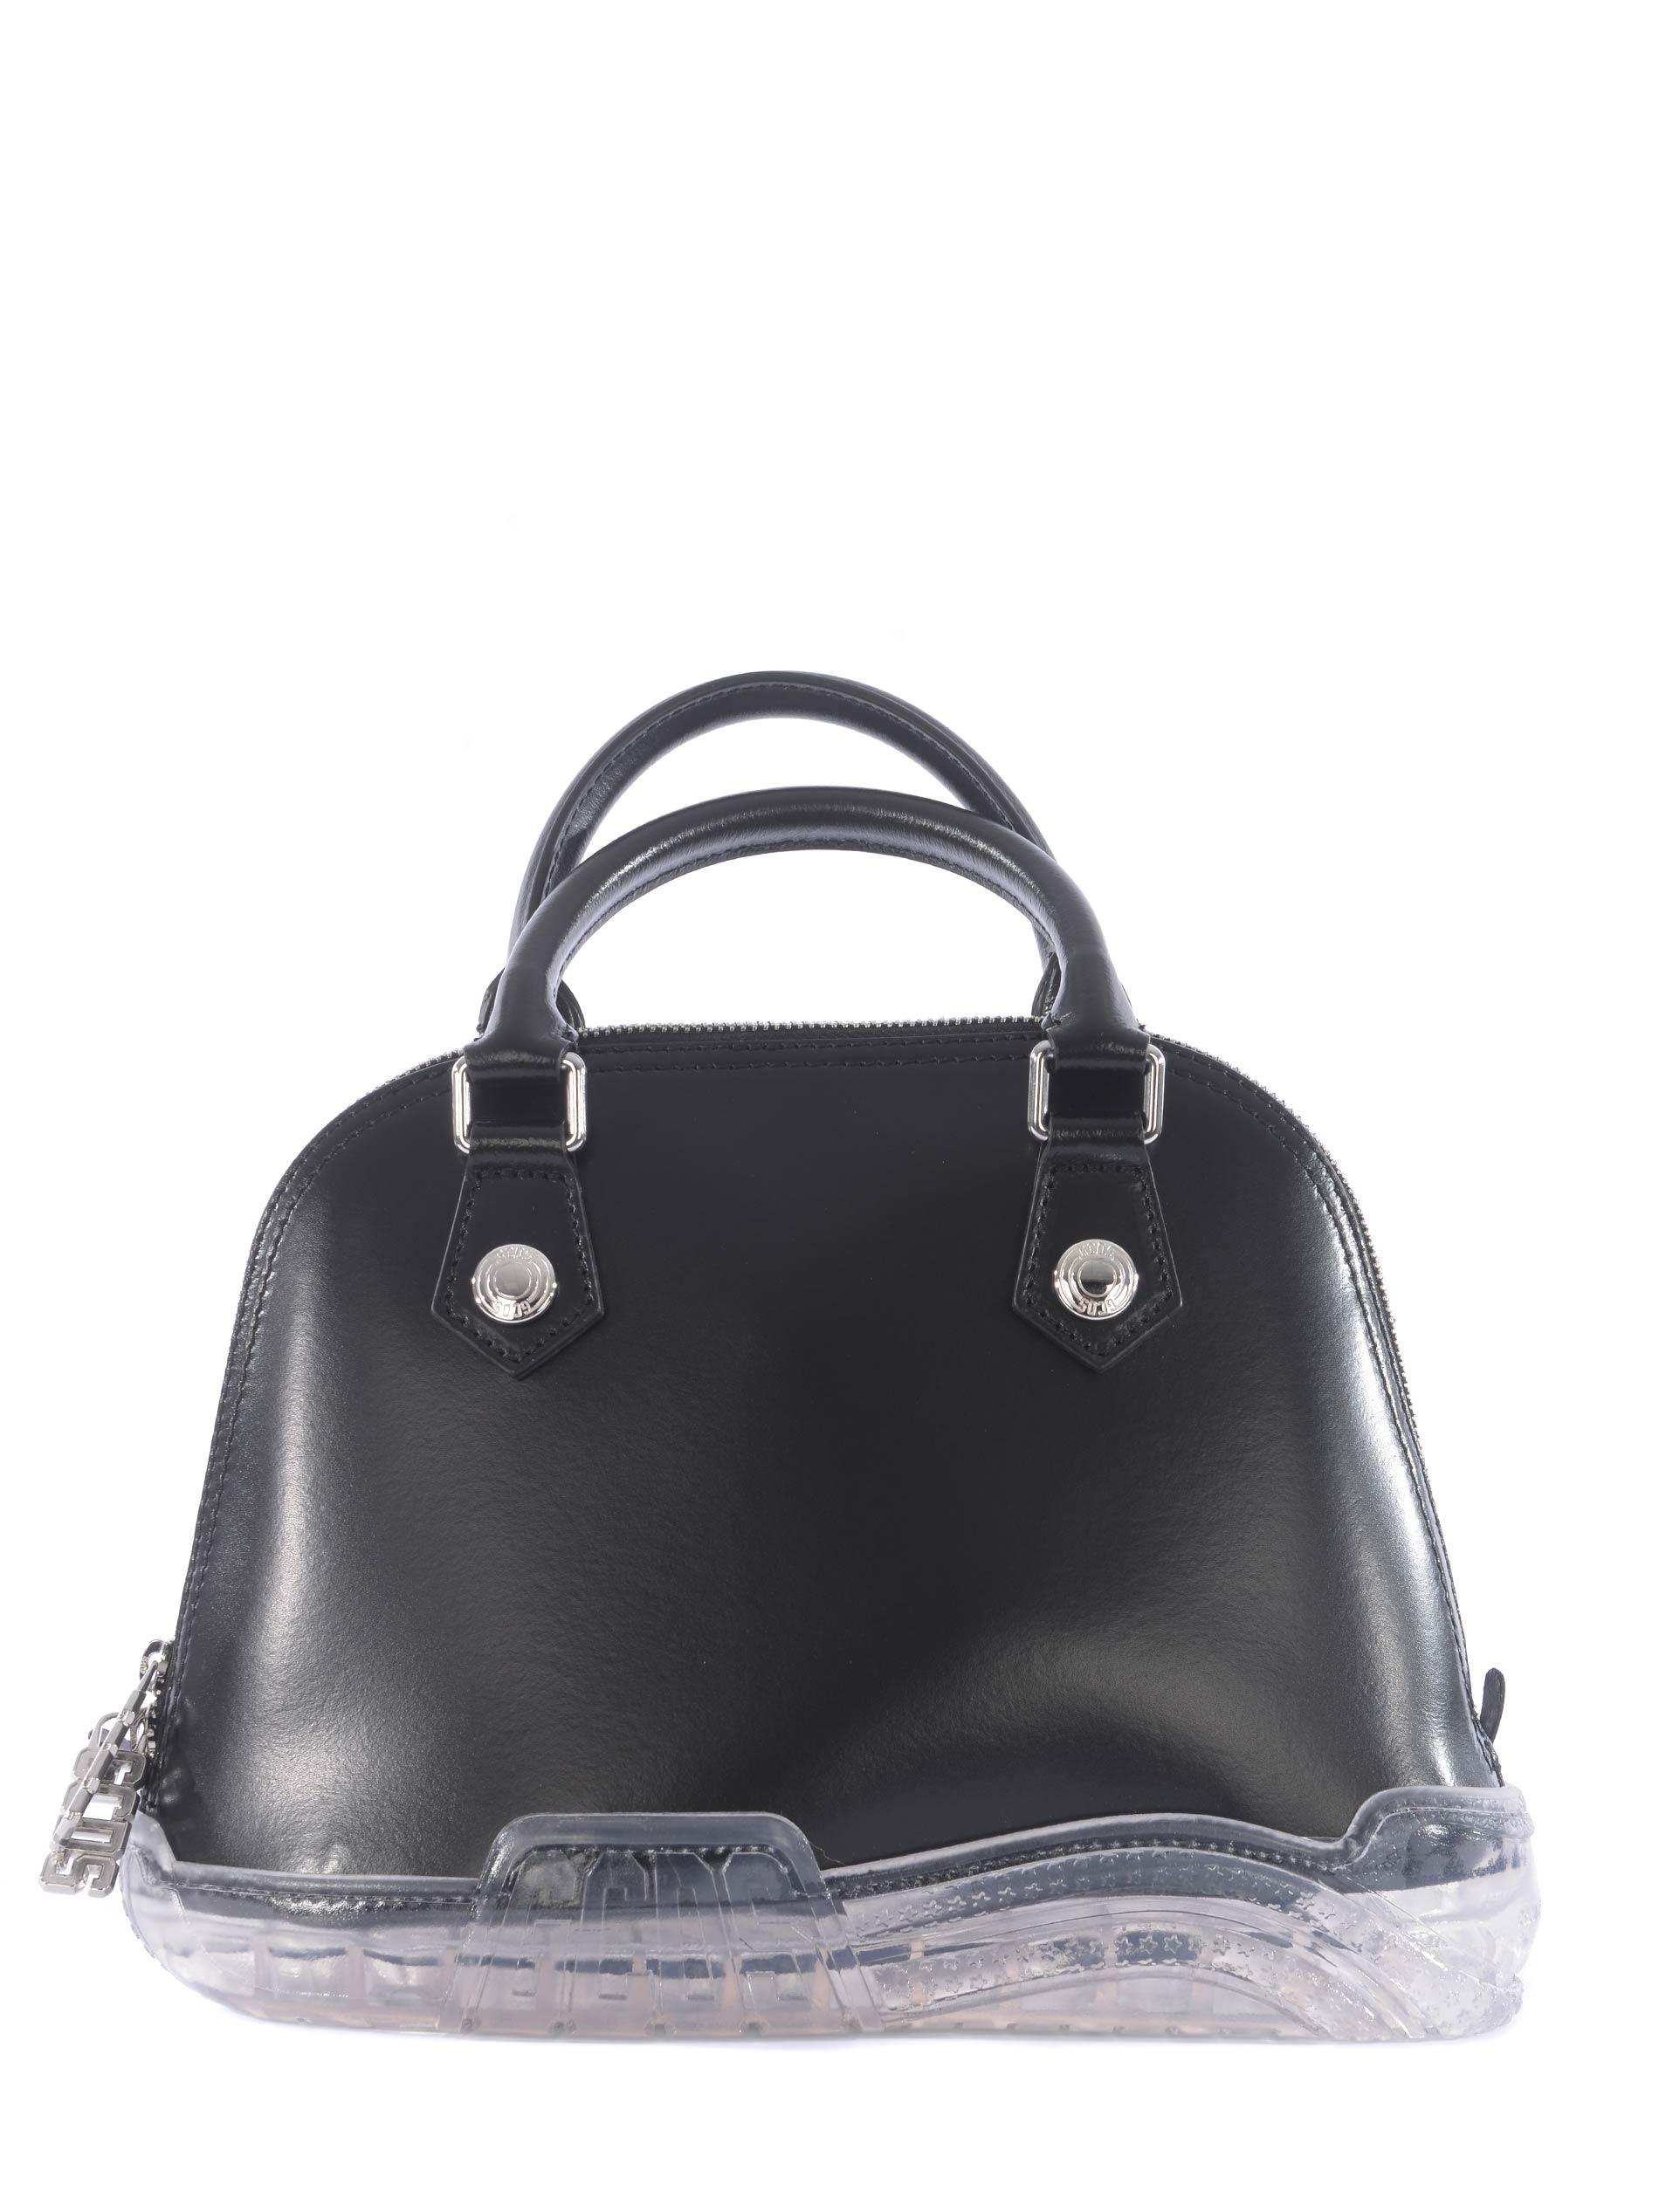 GCDS Sneakers leather bag GCDS | 5032268 | SS21W01003102